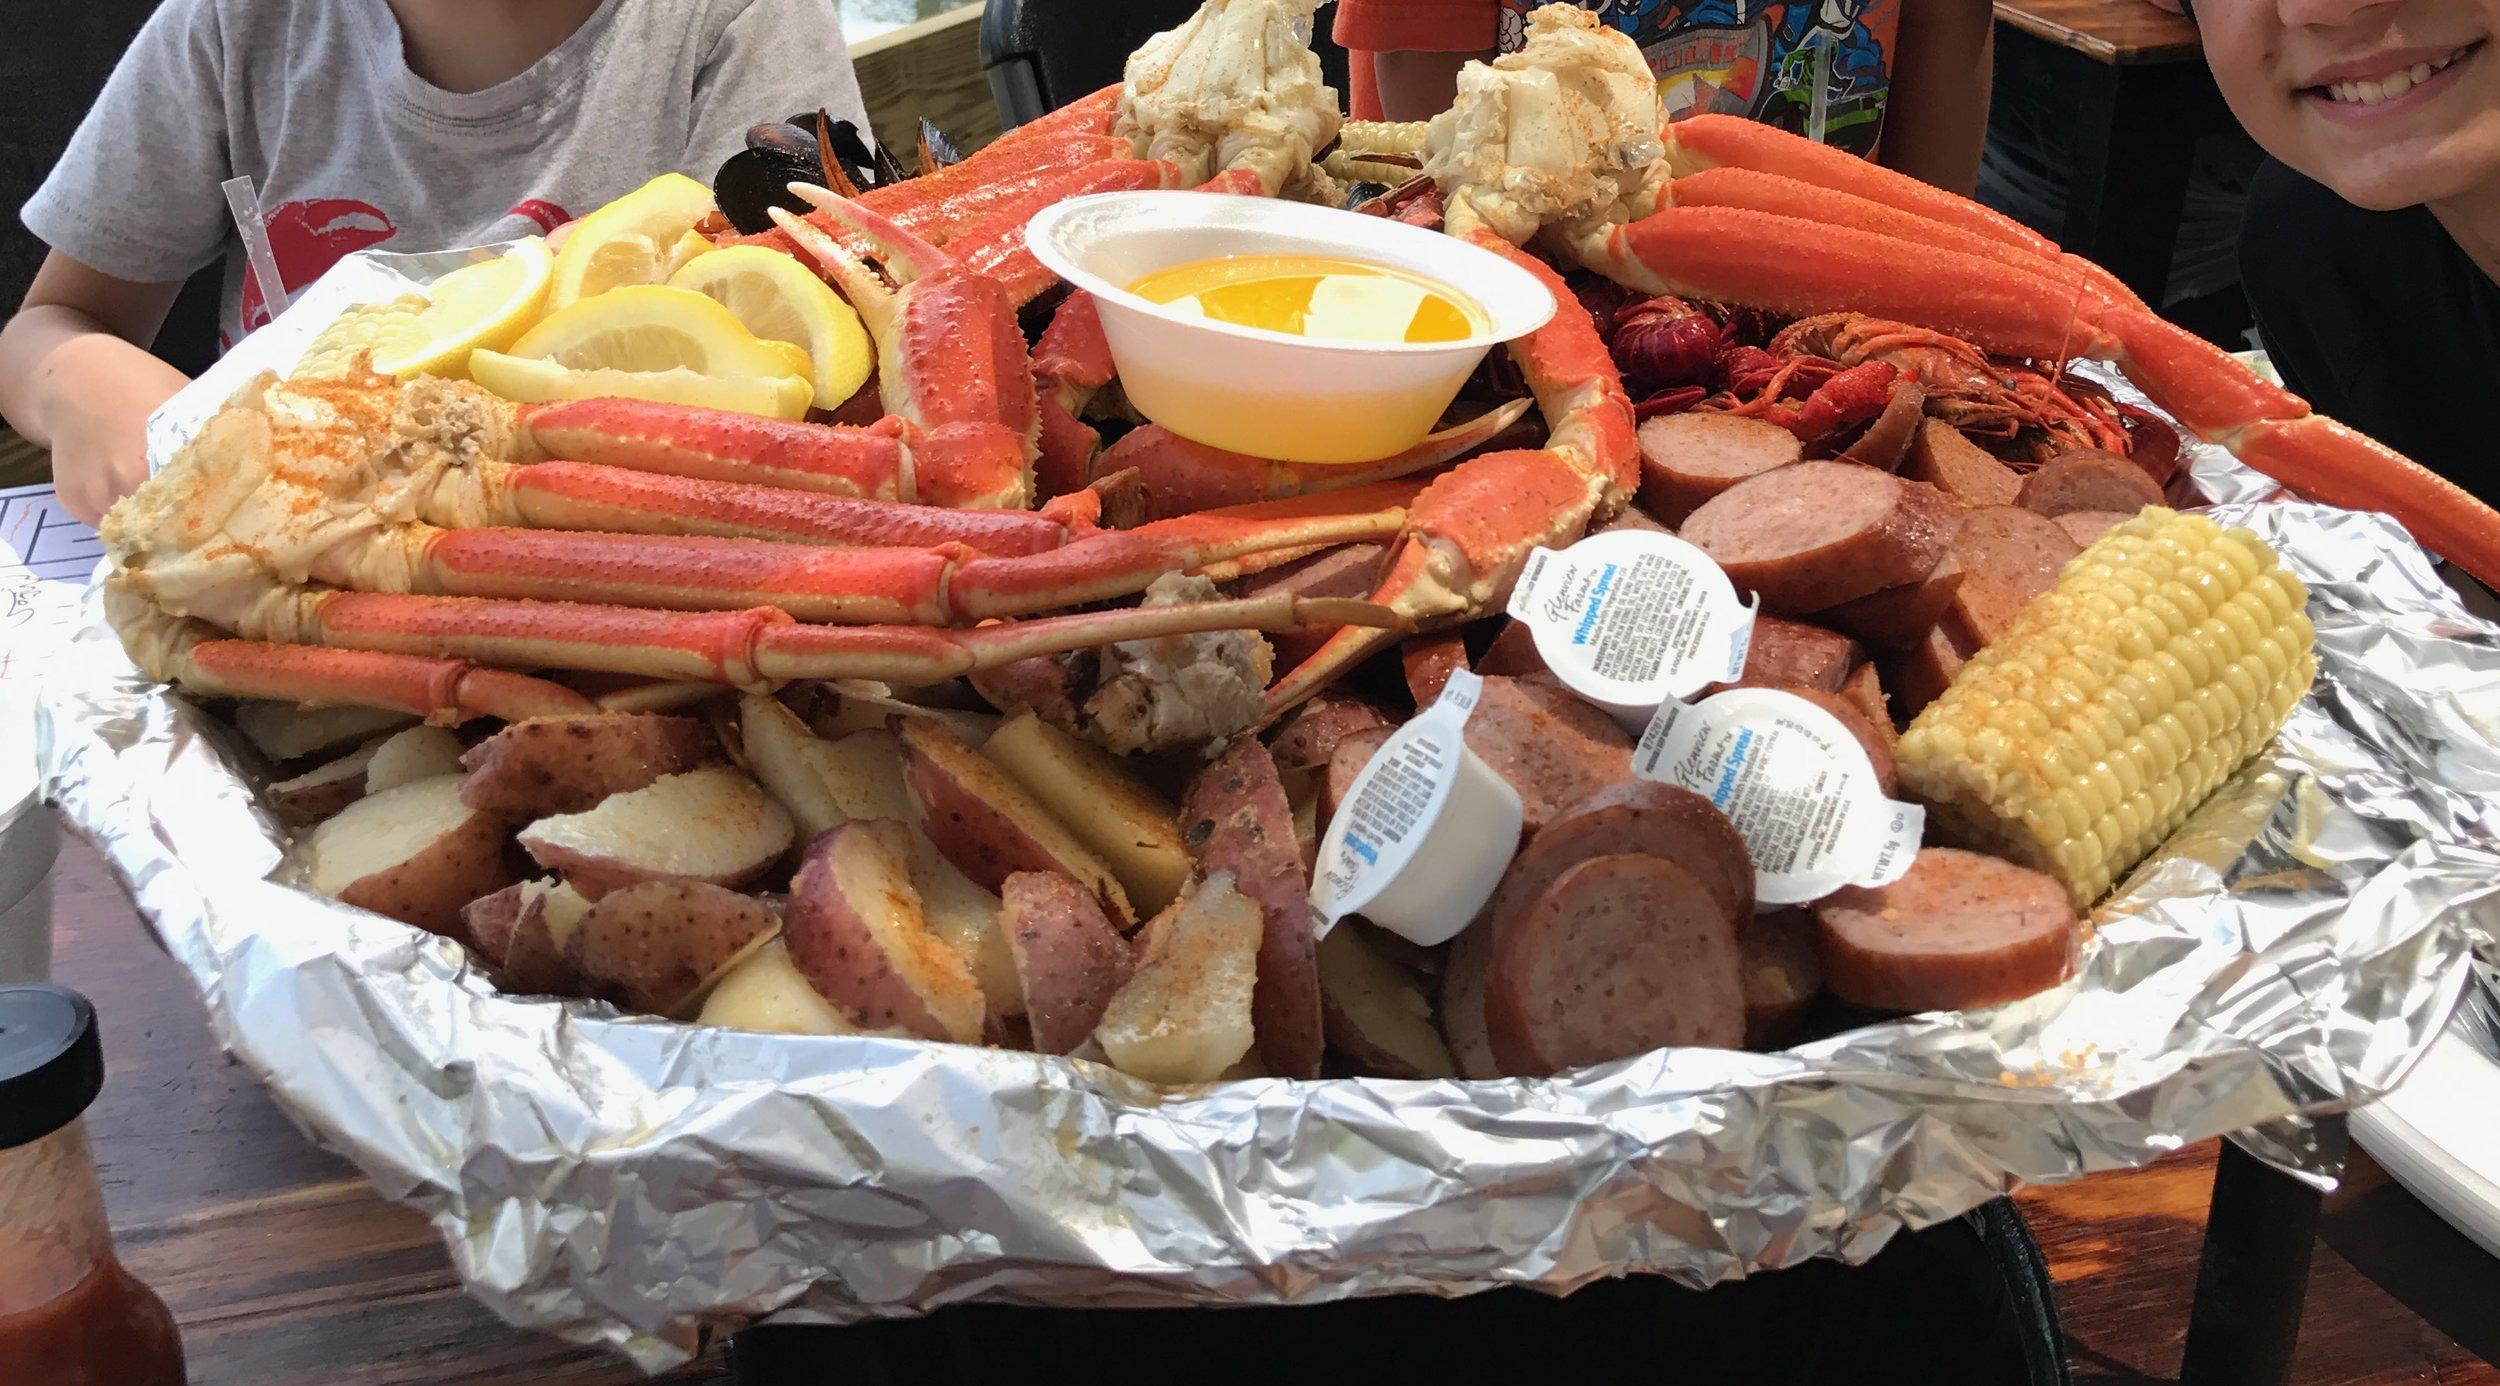 Captain Crab's Sampler Platter at The Crab Shack  (click to enlarge)